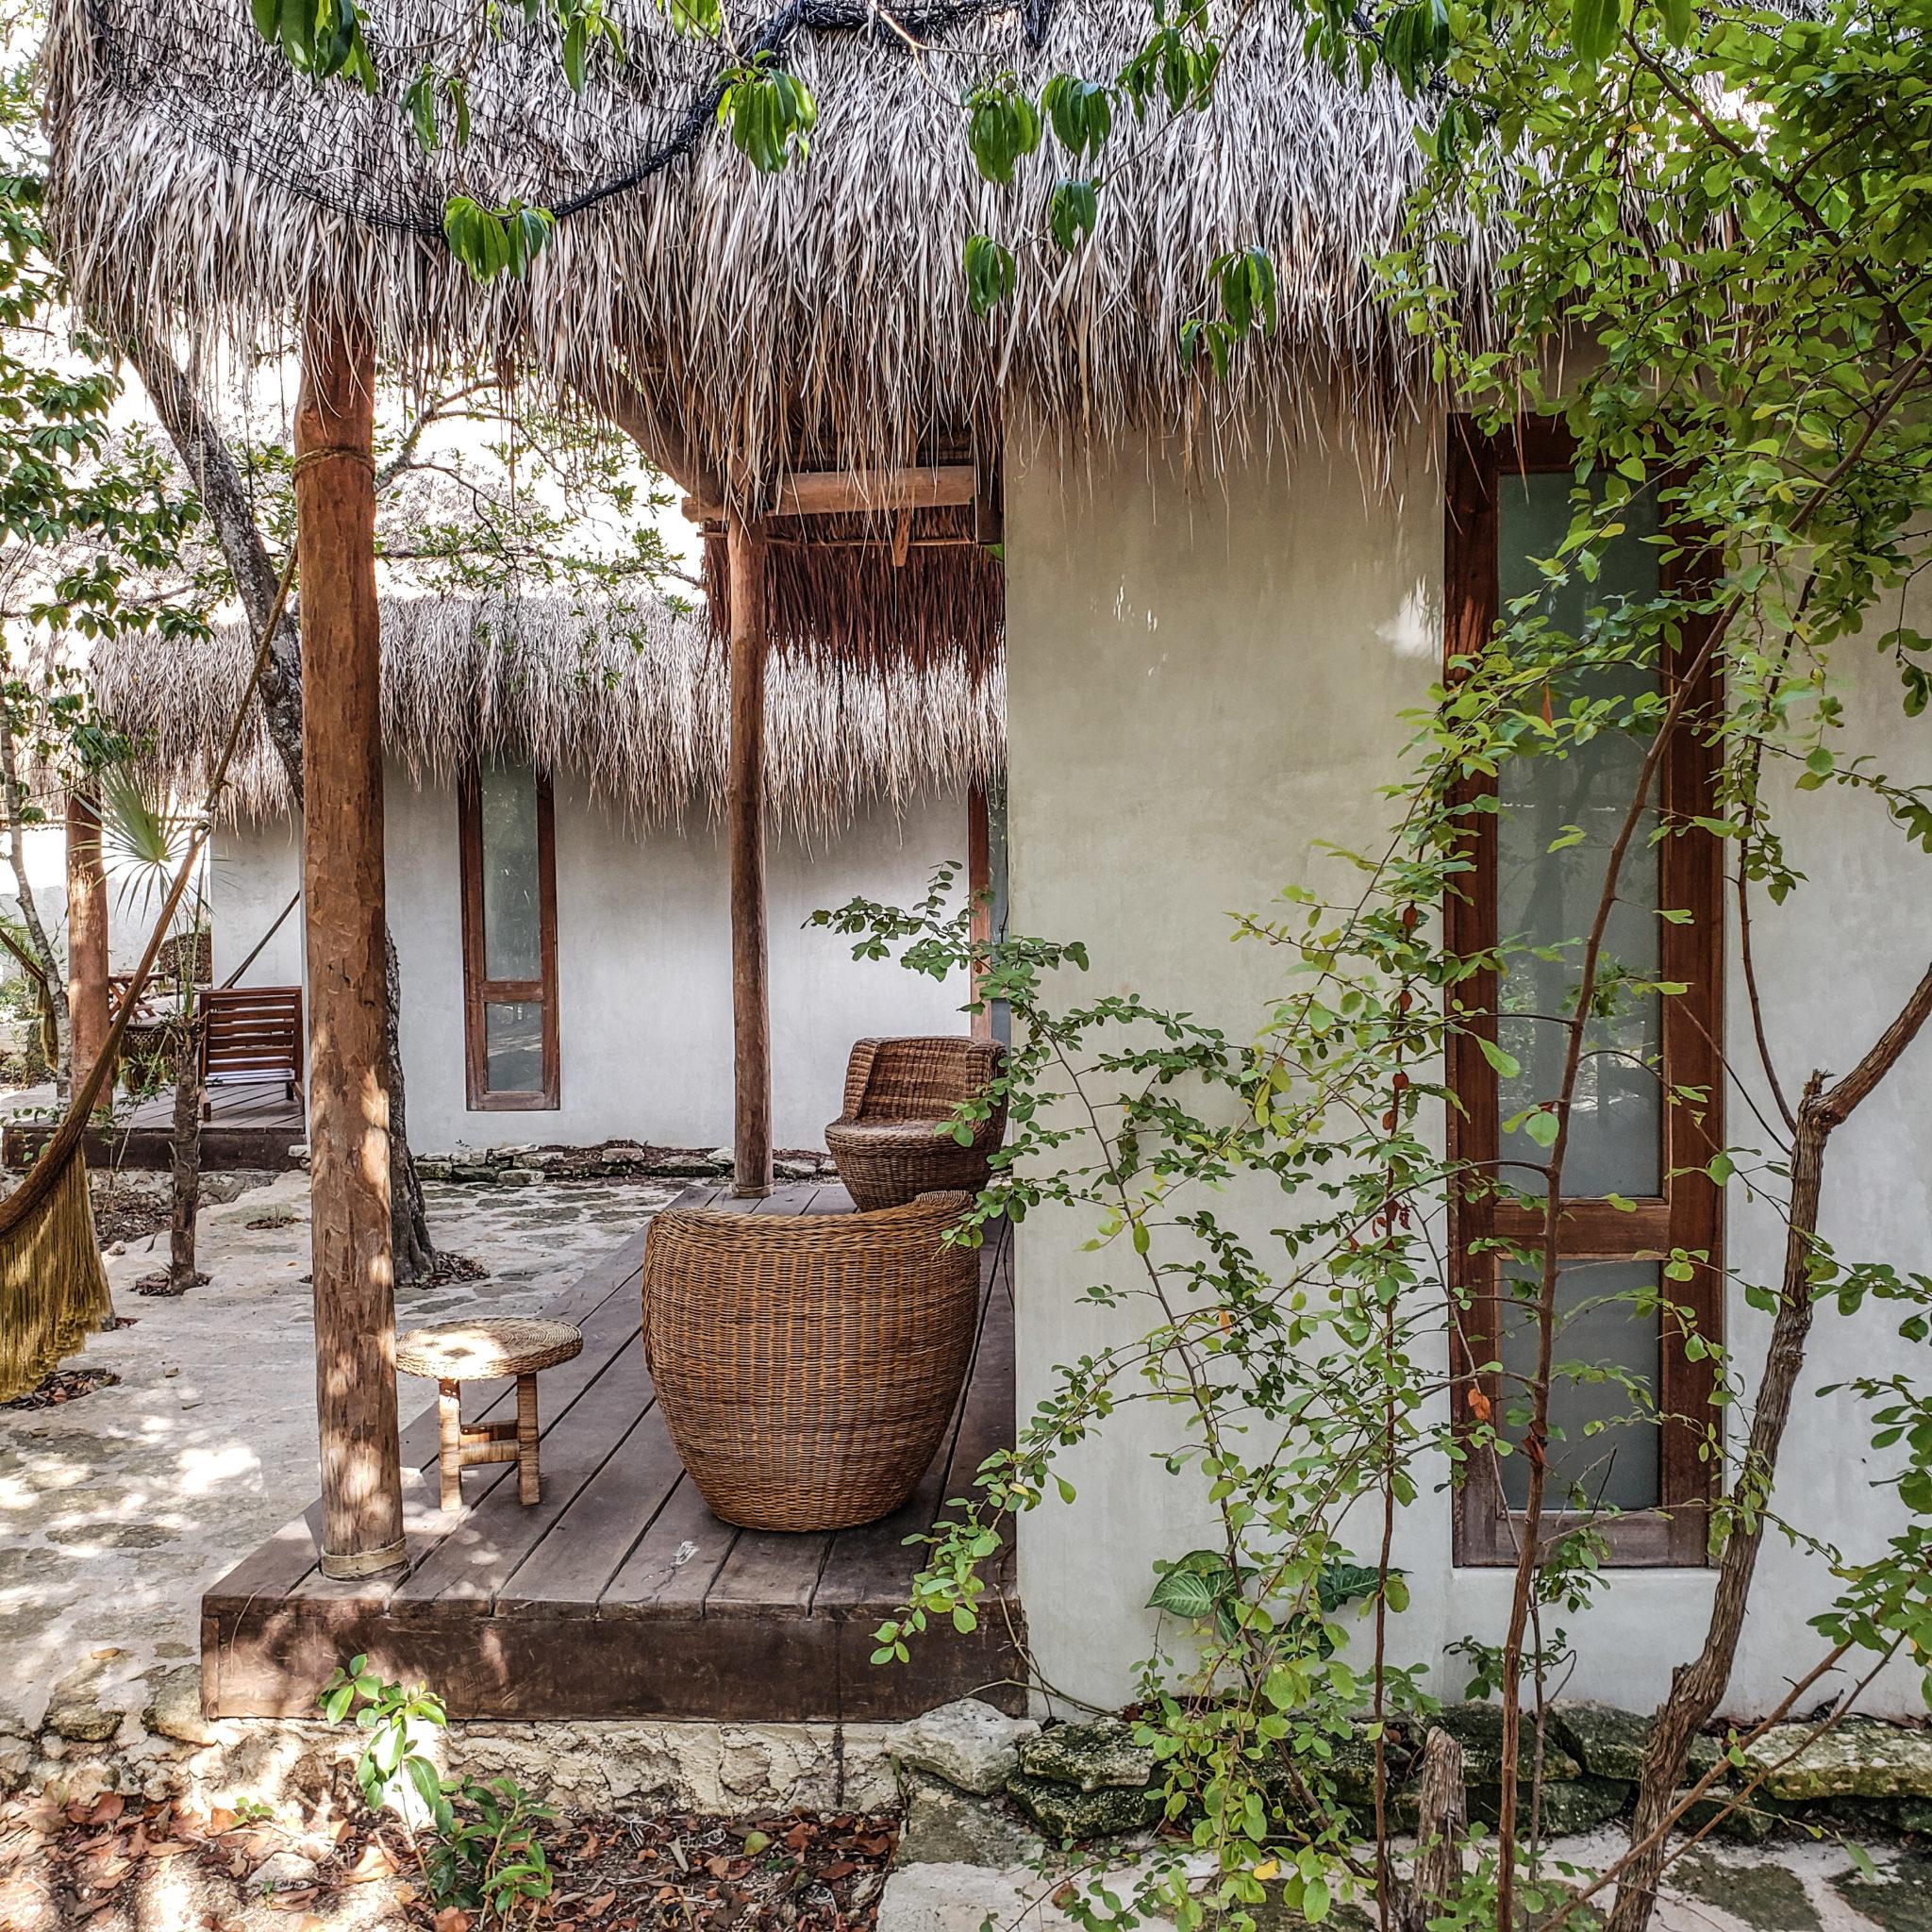 Acacia Jungle Bungalows Tulum - Exterior Vibes